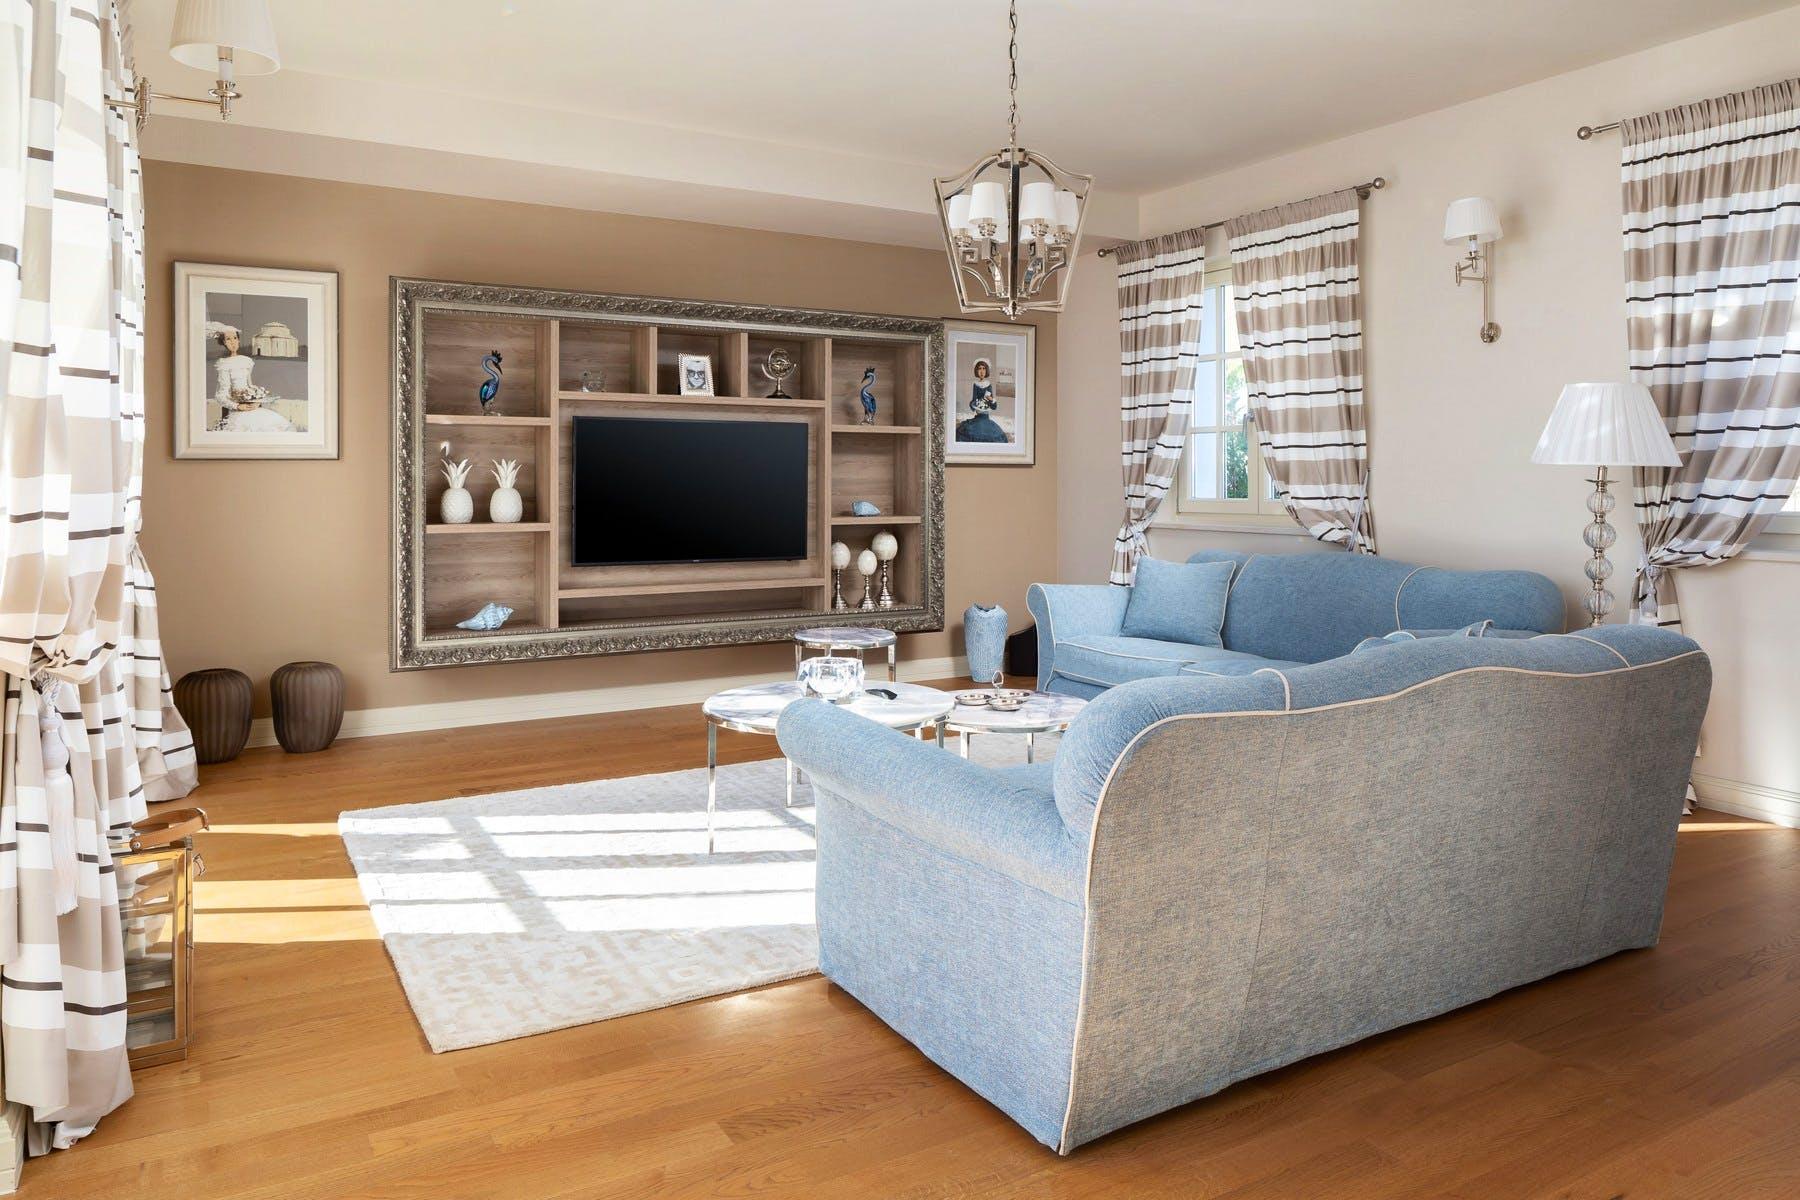 Spacious living room boasting timeless elegance